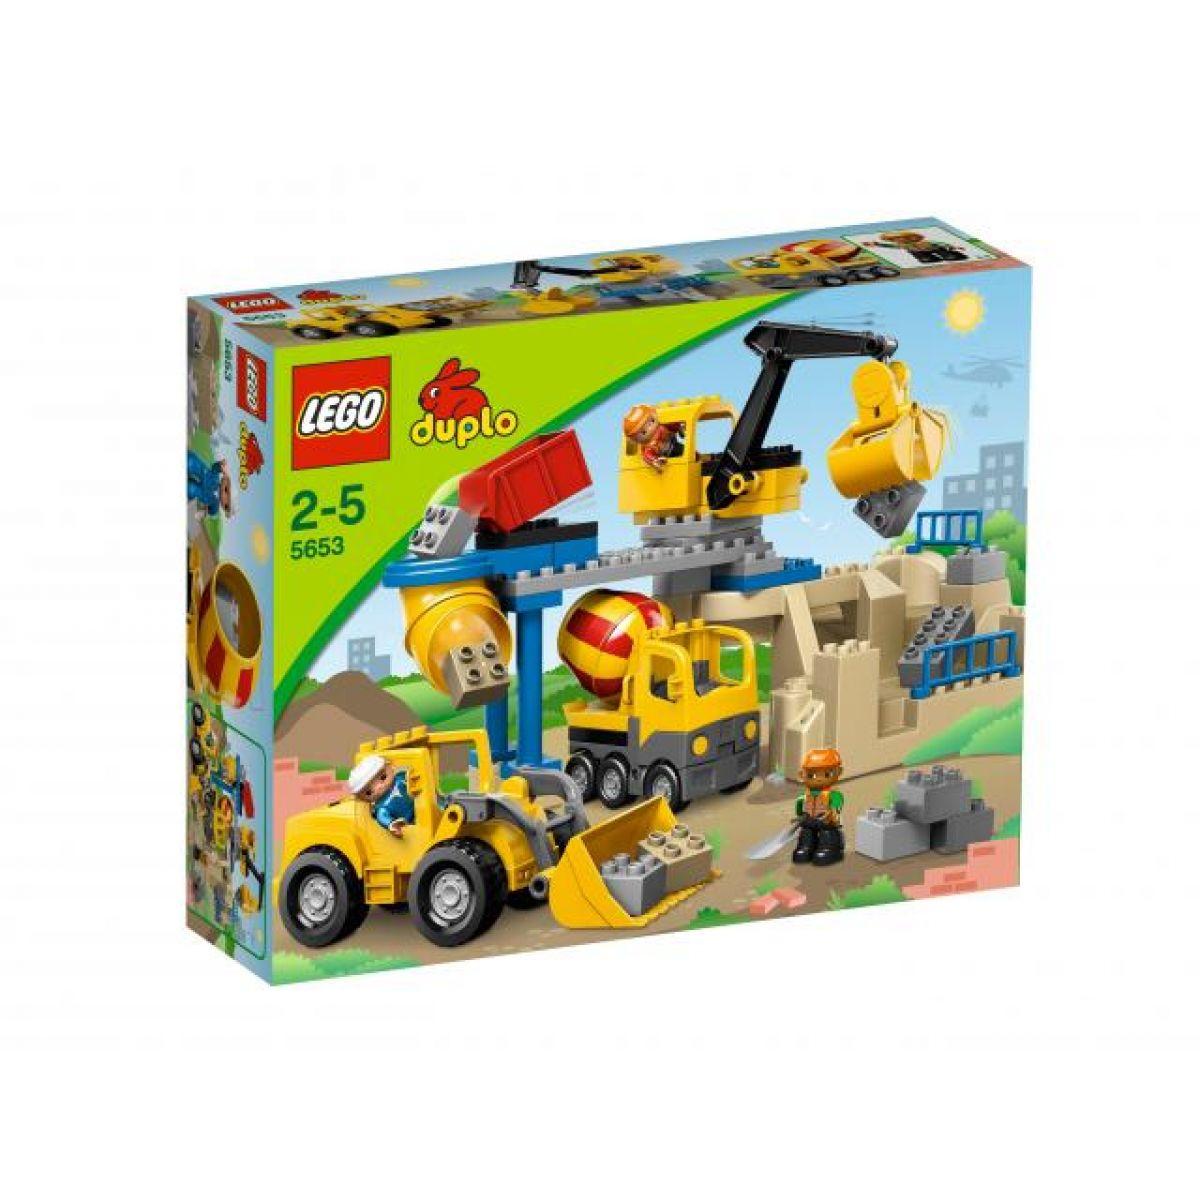 LEGO DUPLO 5653 Kamenolom